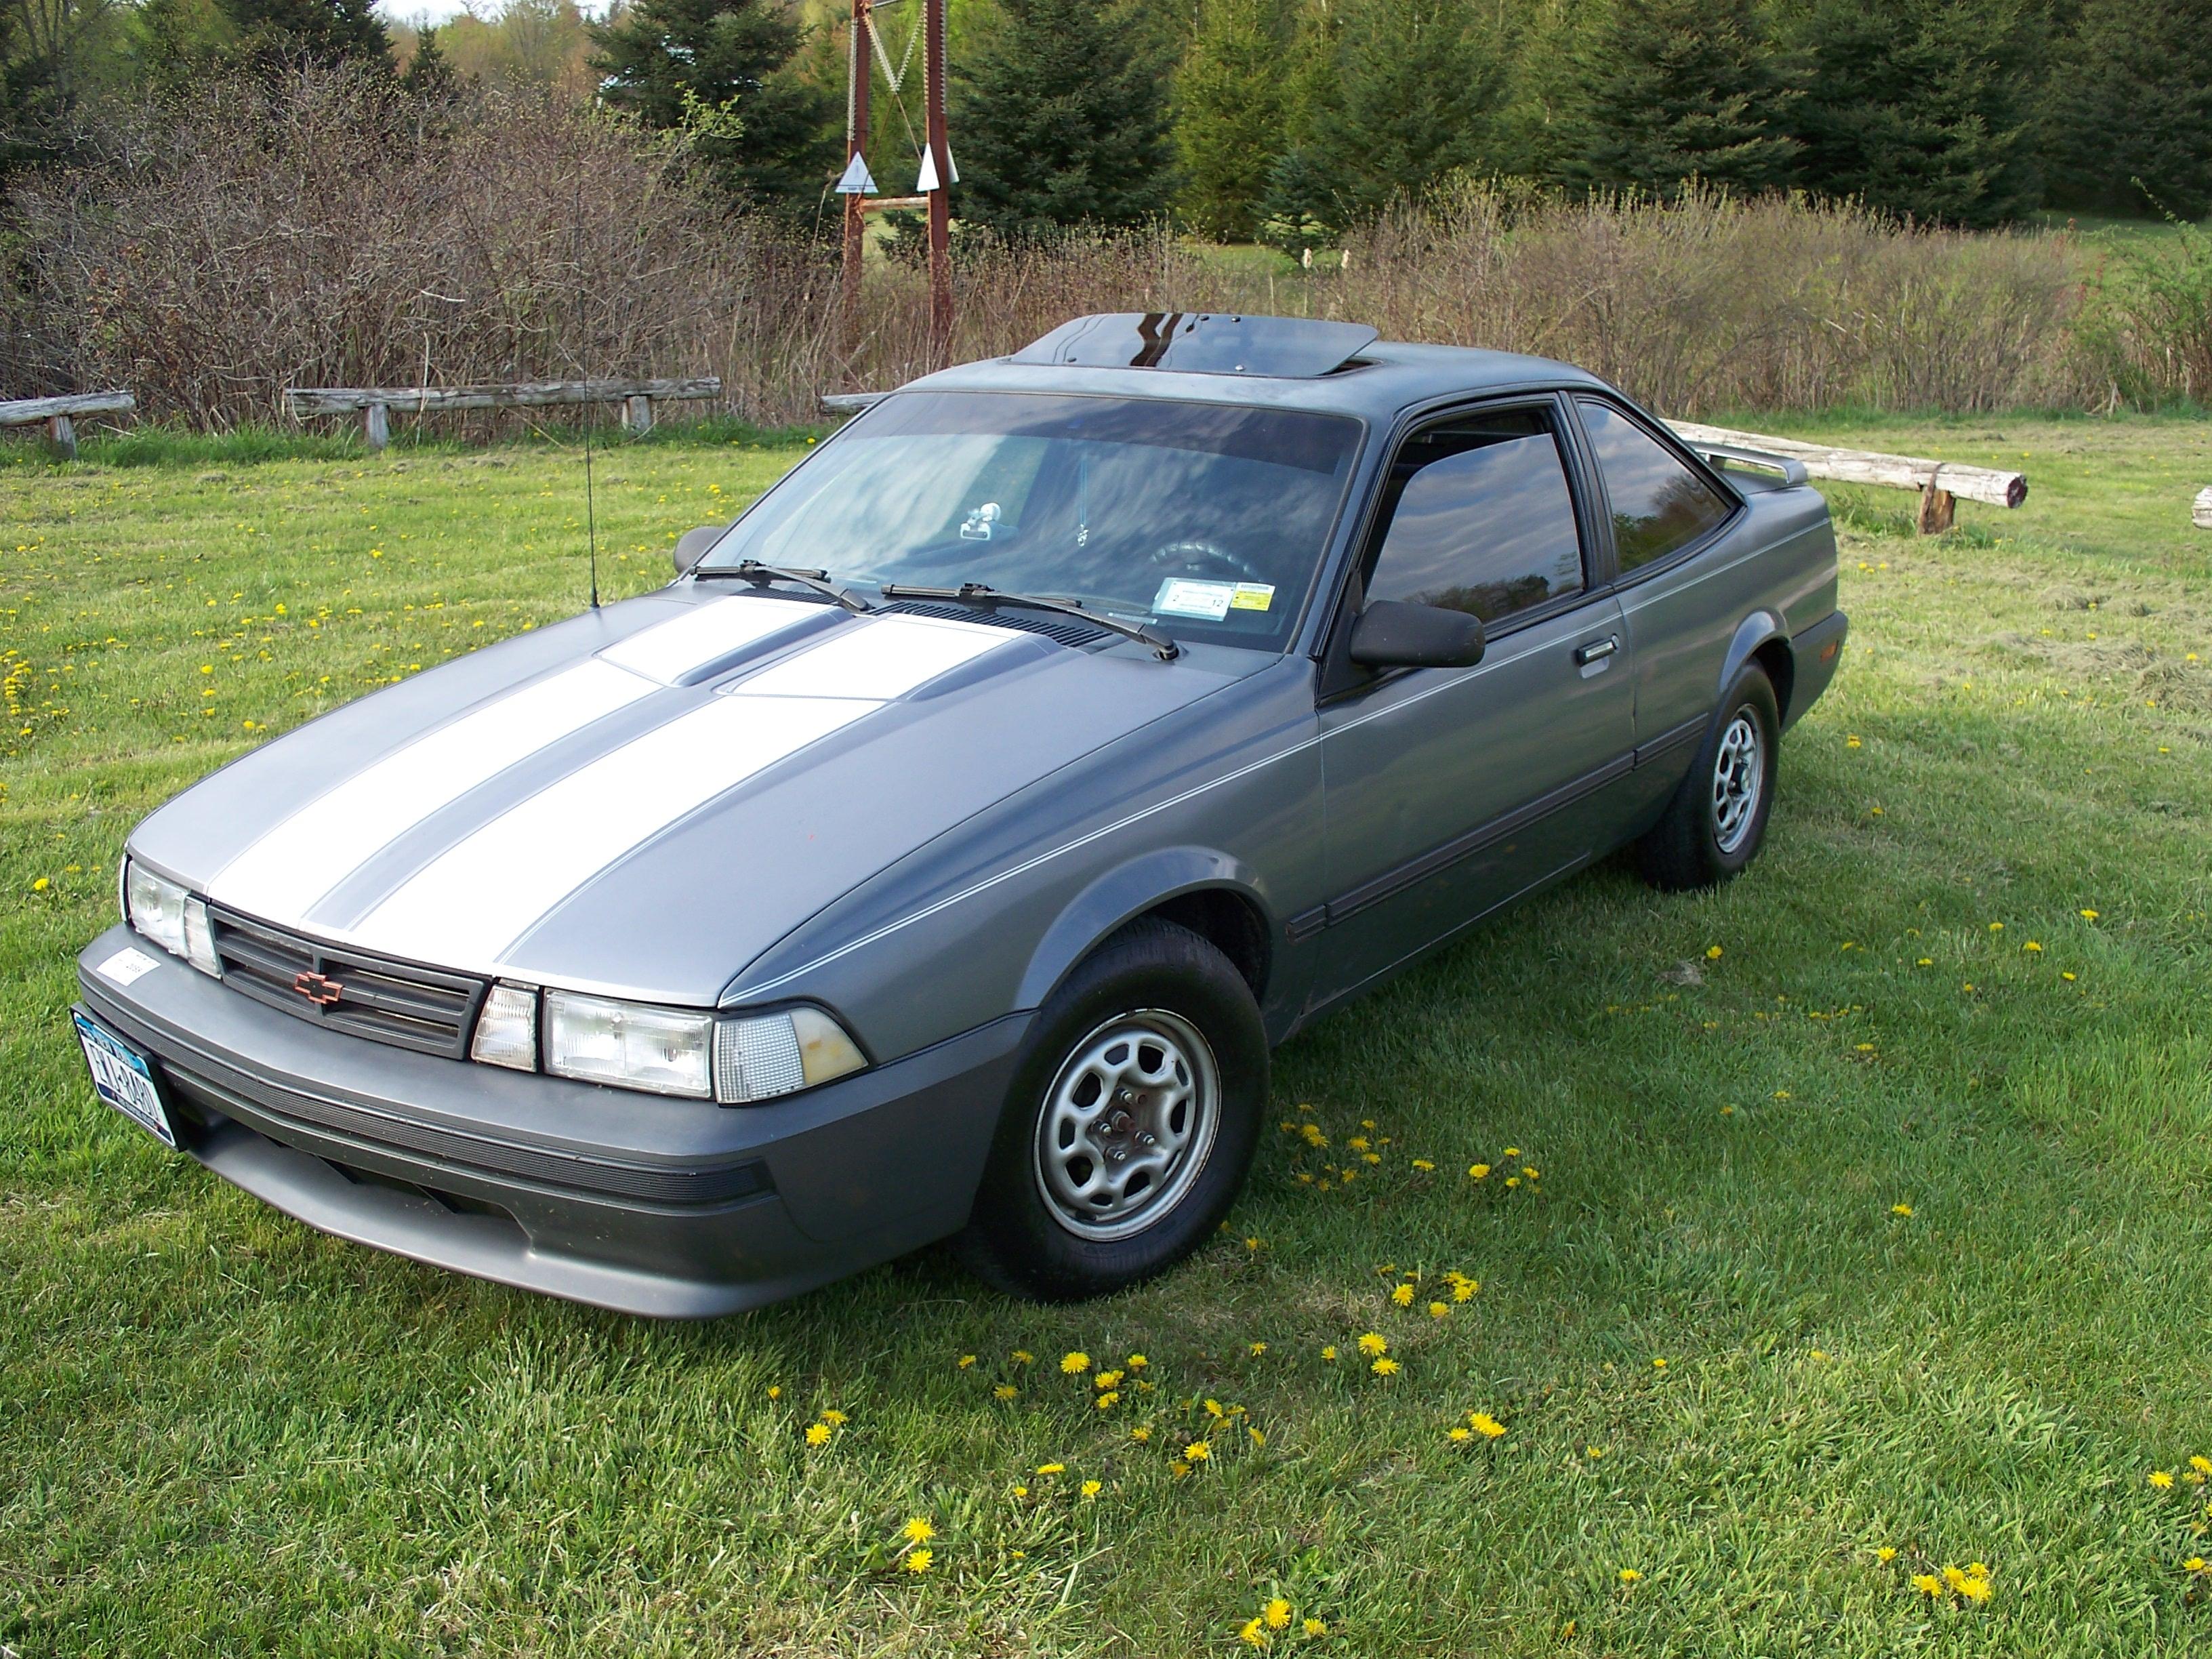 Chevrolet Cavalier 1990 foto - 5